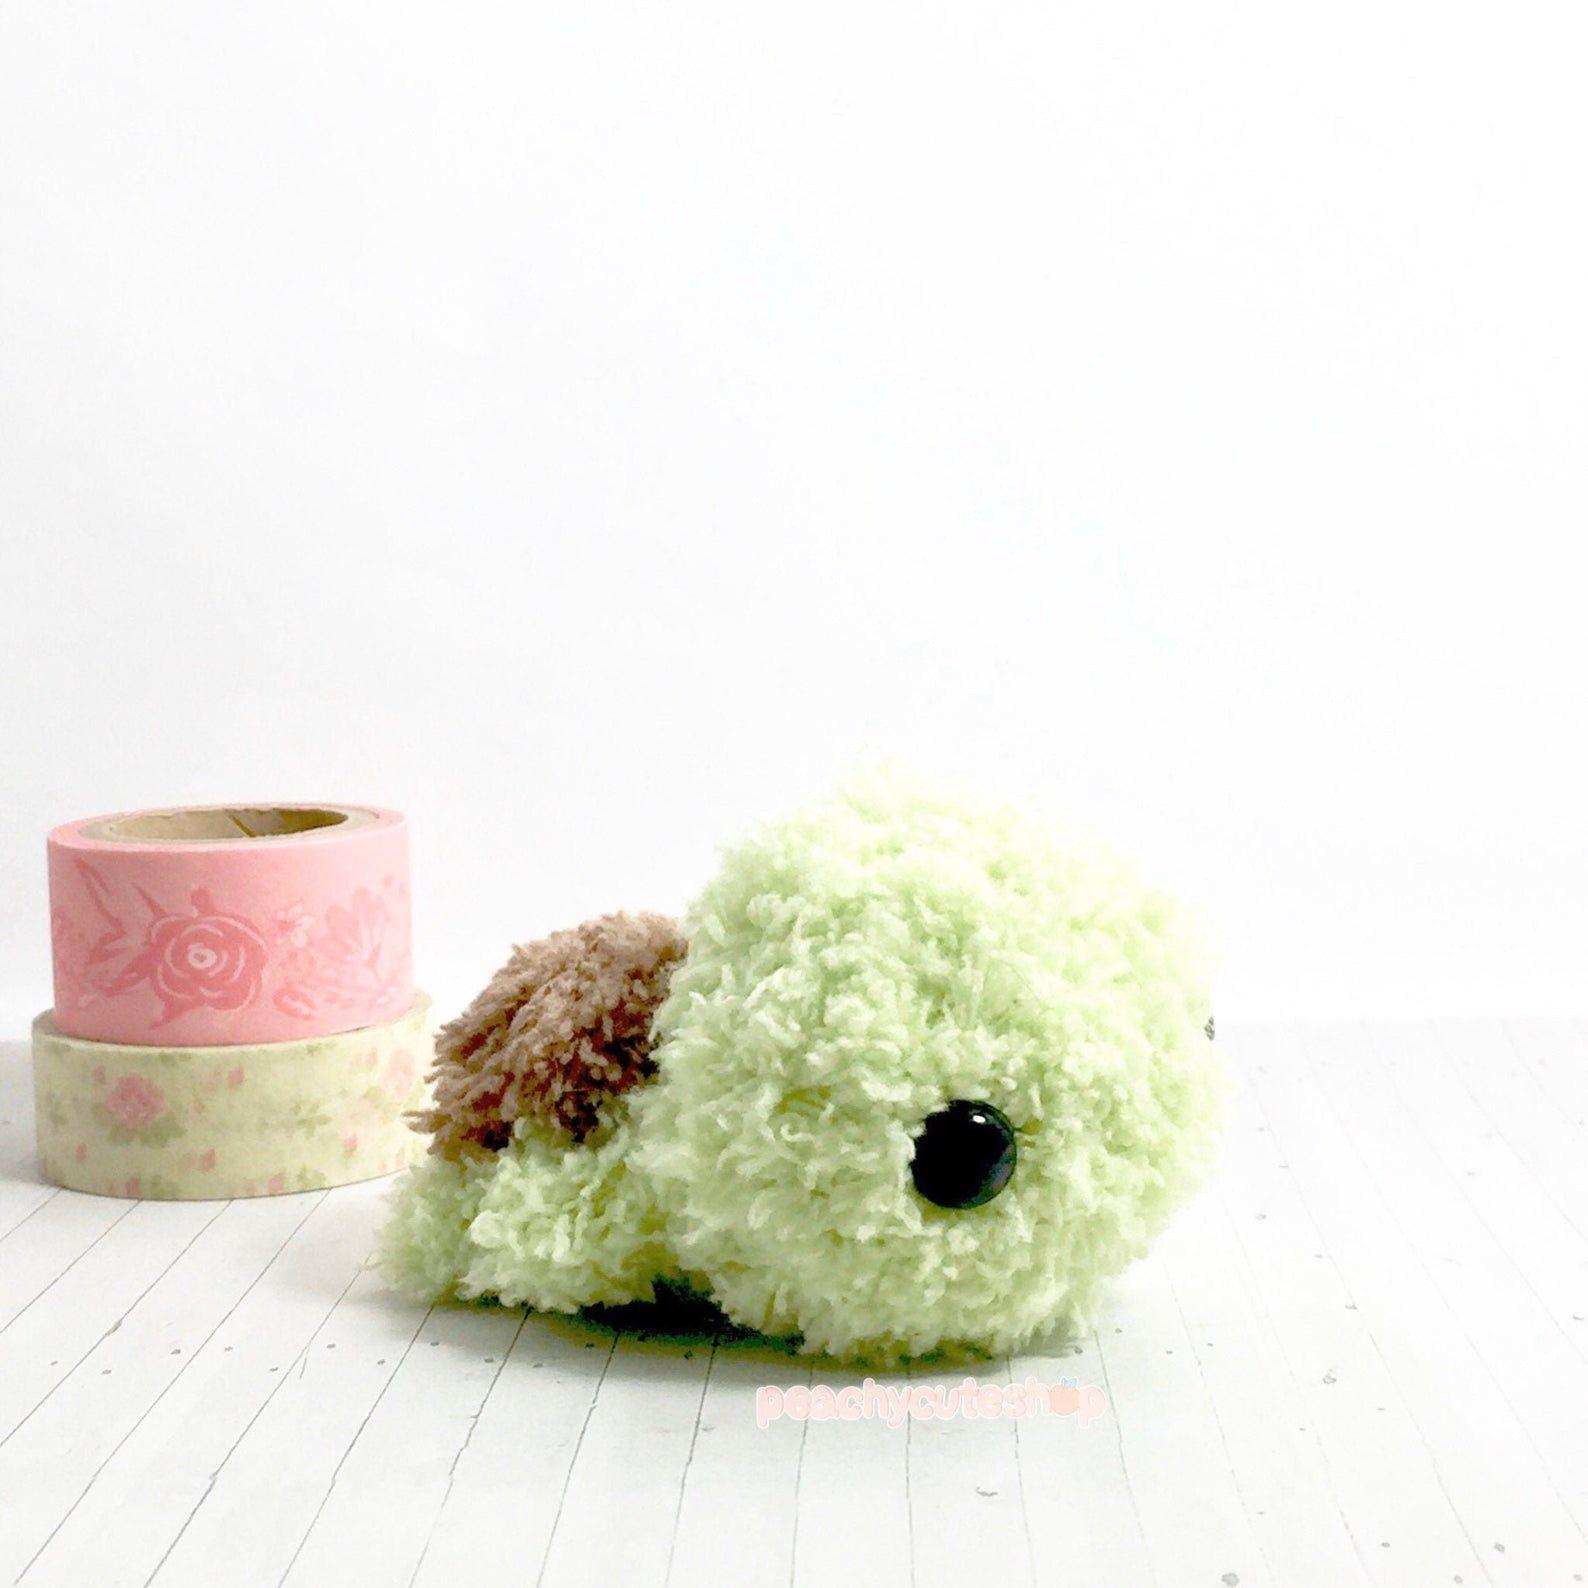 Turtle Plush - Fluffy Turtle - Amigurumi Turtle - Kawaii Amigurumi - Turtle Toy - Turtle Stuffed Animal - Crochet Turtle - Gift For Teens